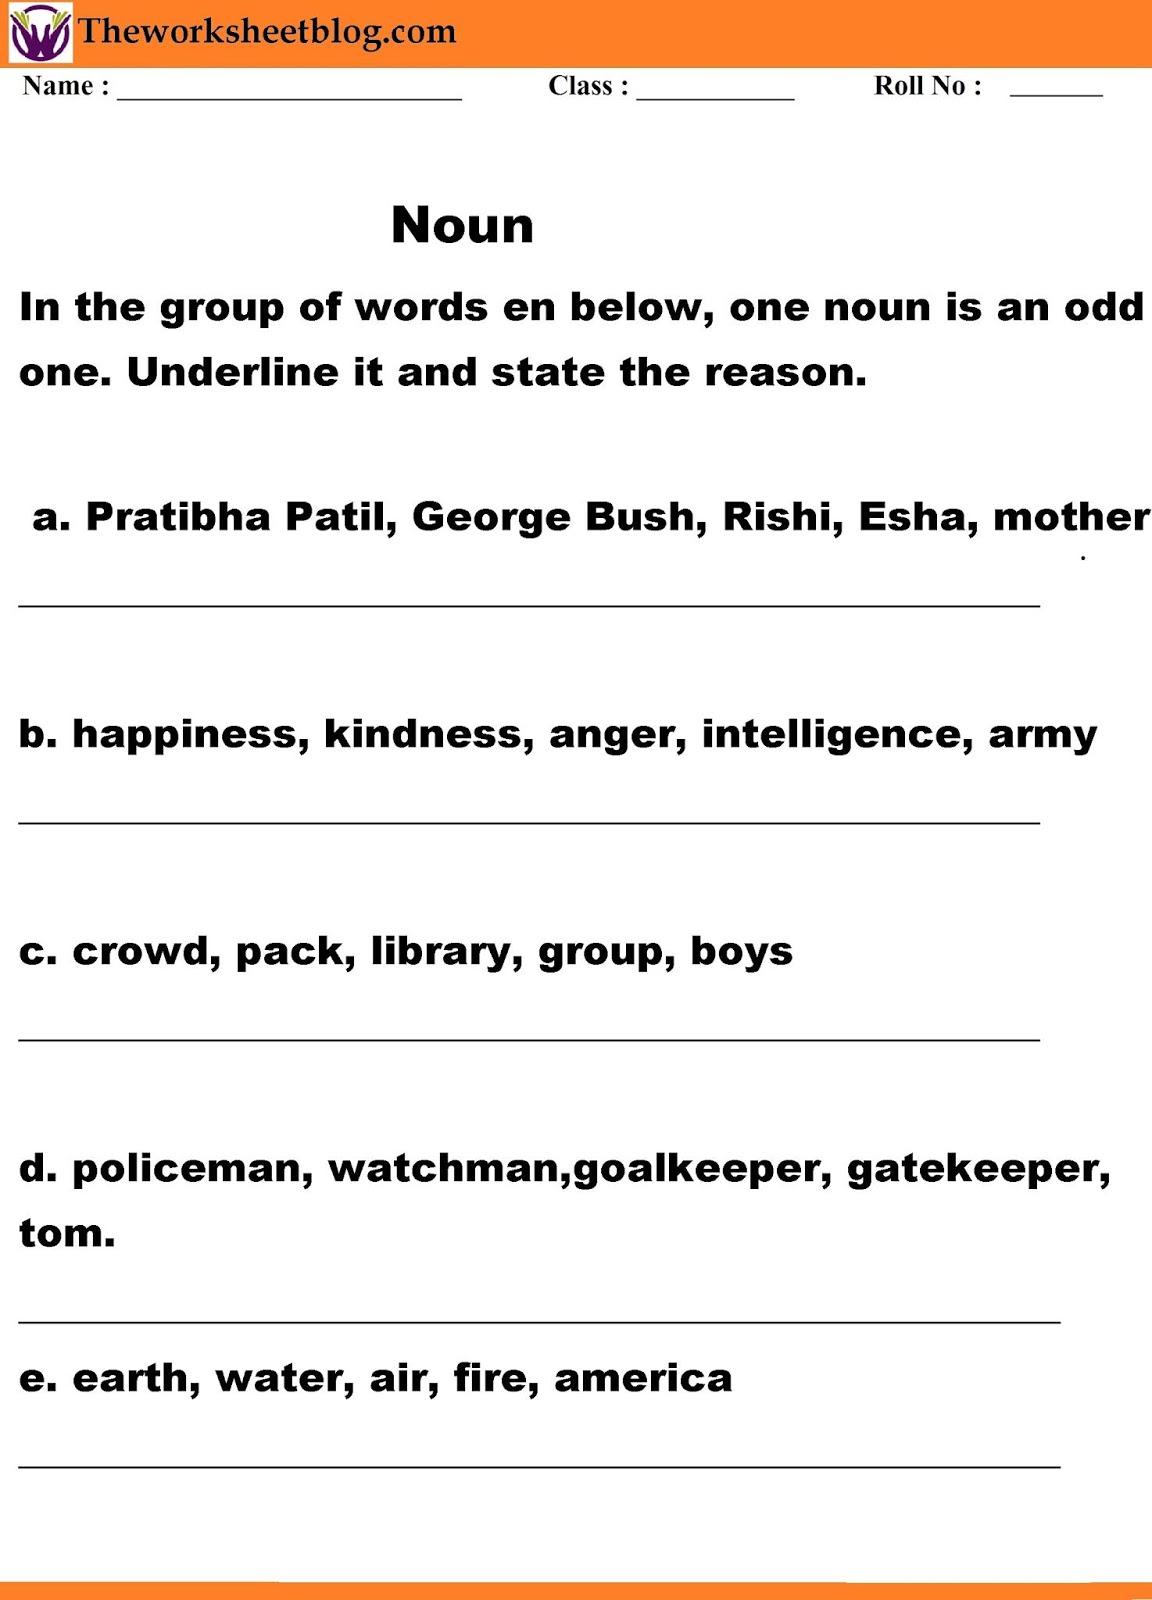 Noun Worksheets - Theworksheetsblog [ 1600 x 1152 Pixel ]